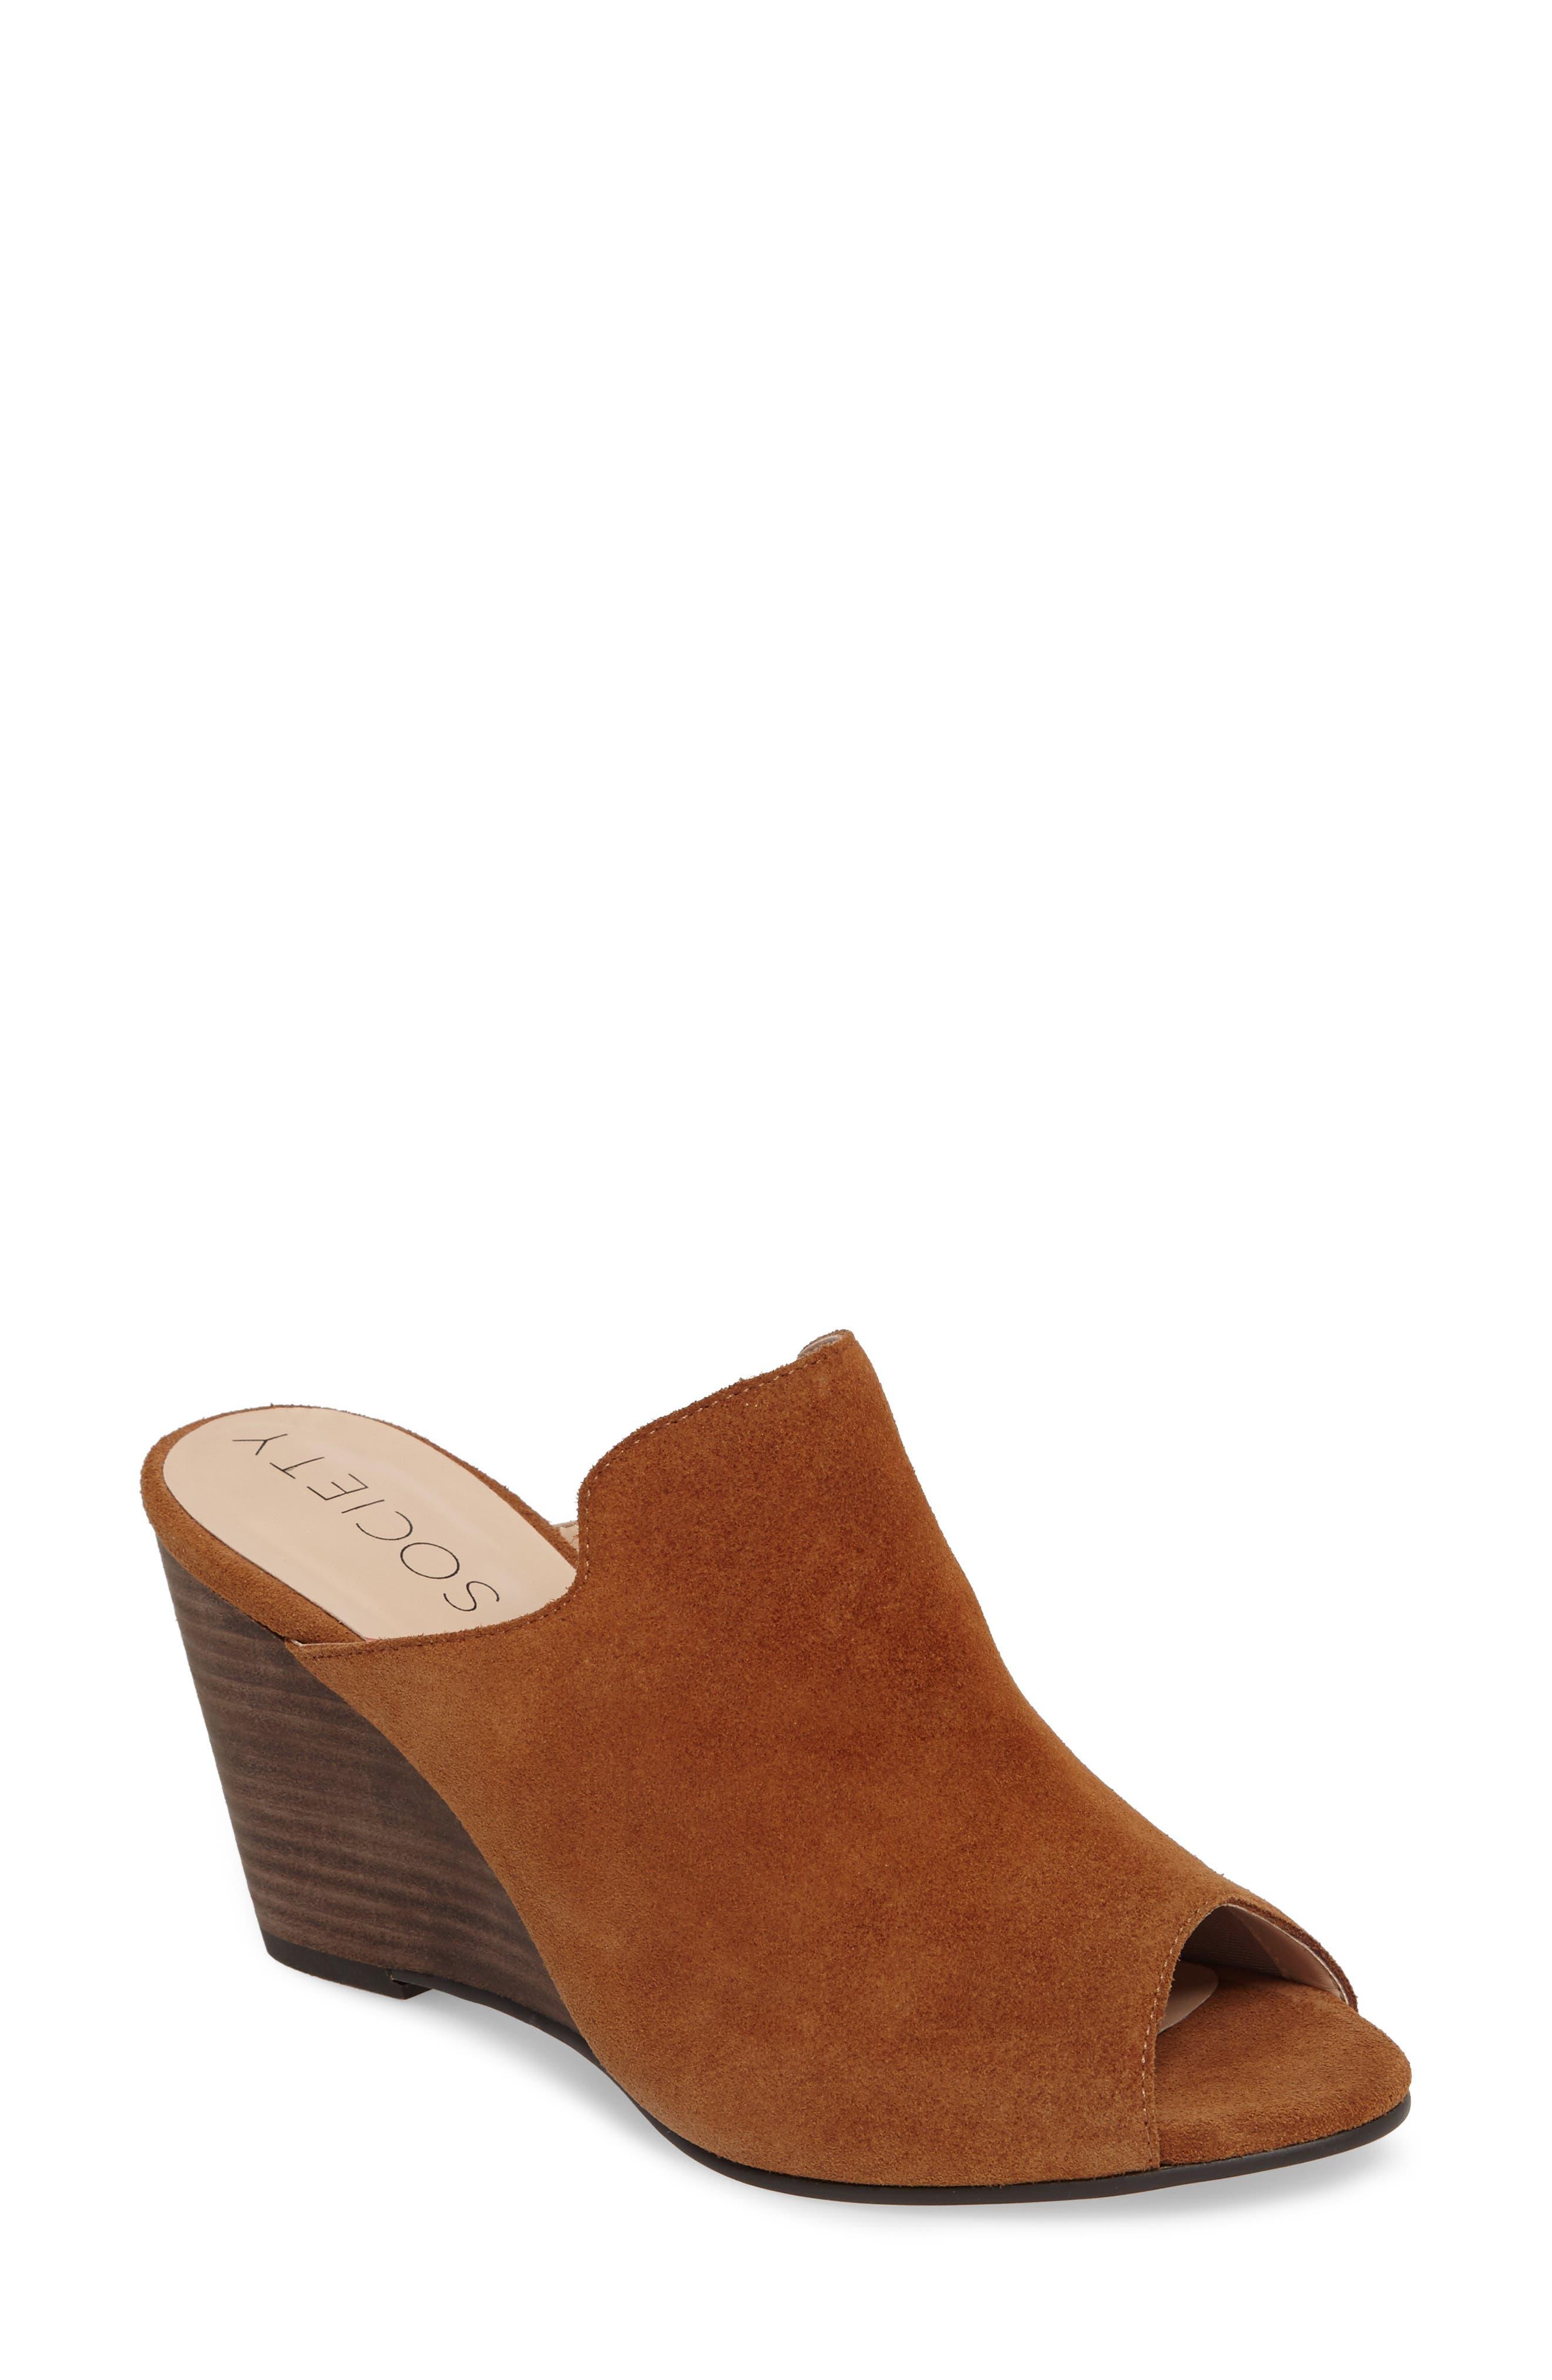 Drew Open-Toe Wedge Mule,                         Main,                         color, Cognac Suede